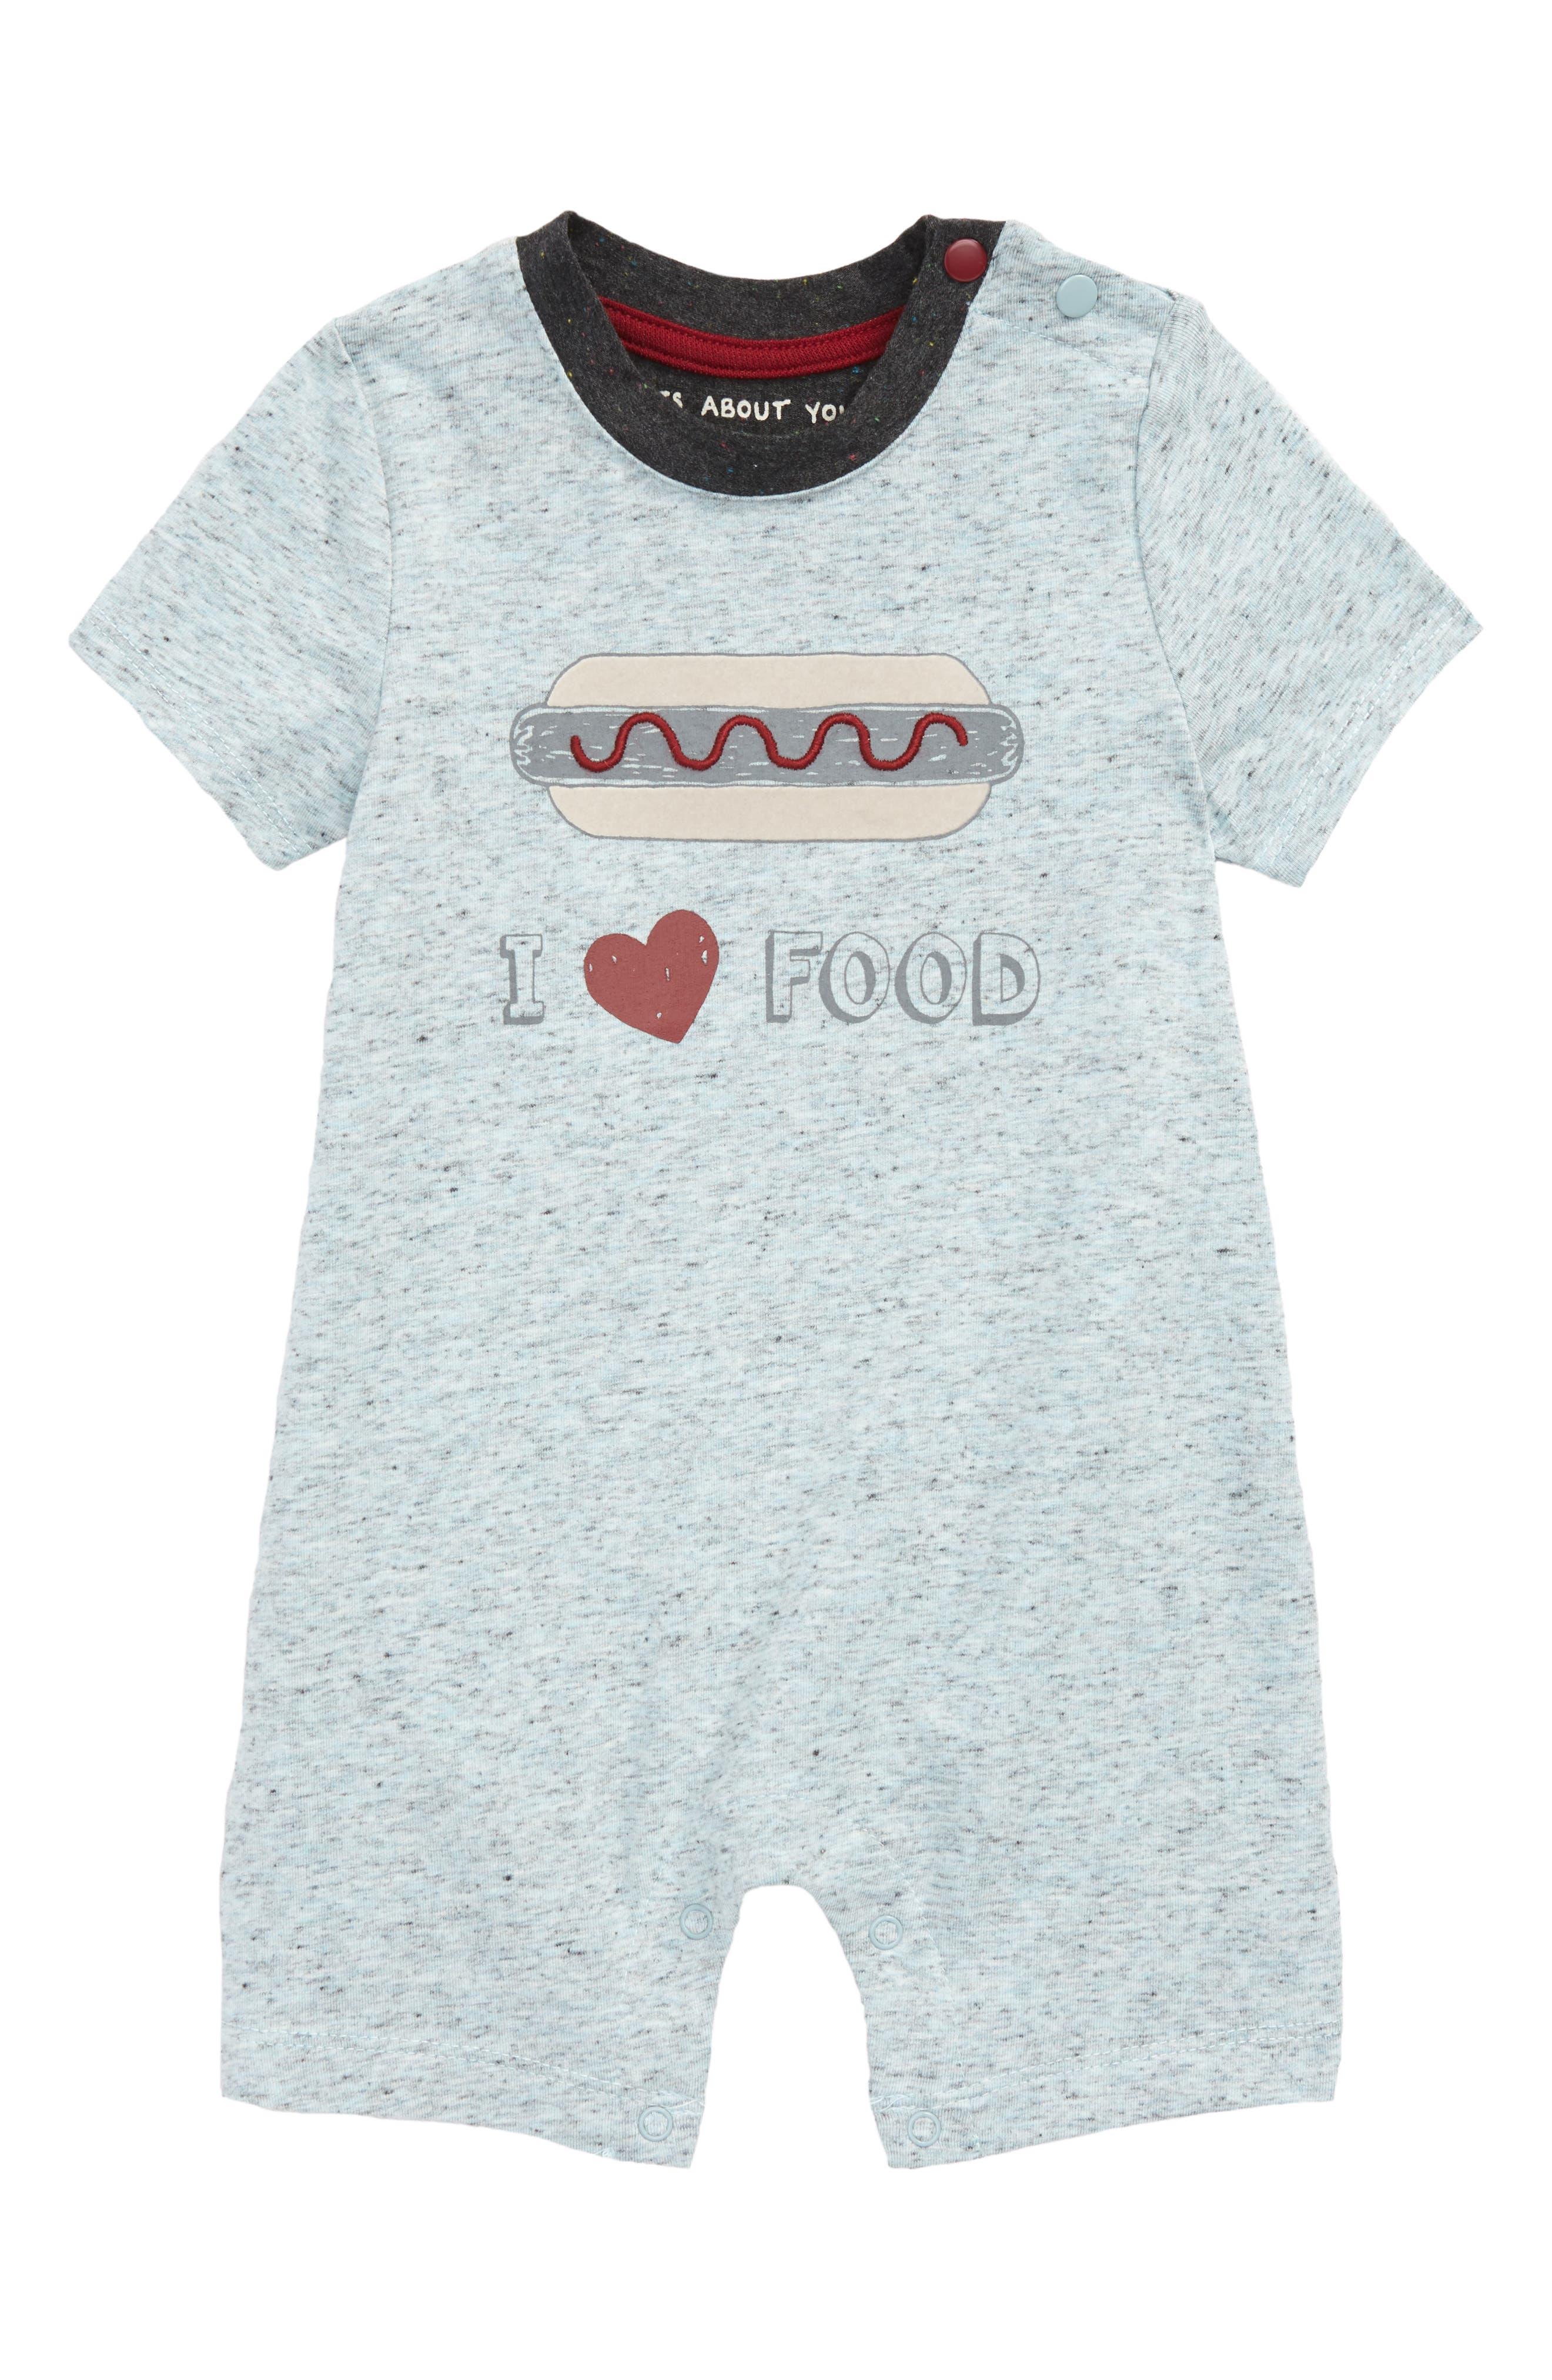 Alternate Image 1 Selected - Robeez® I Love Food Romper (Baby)